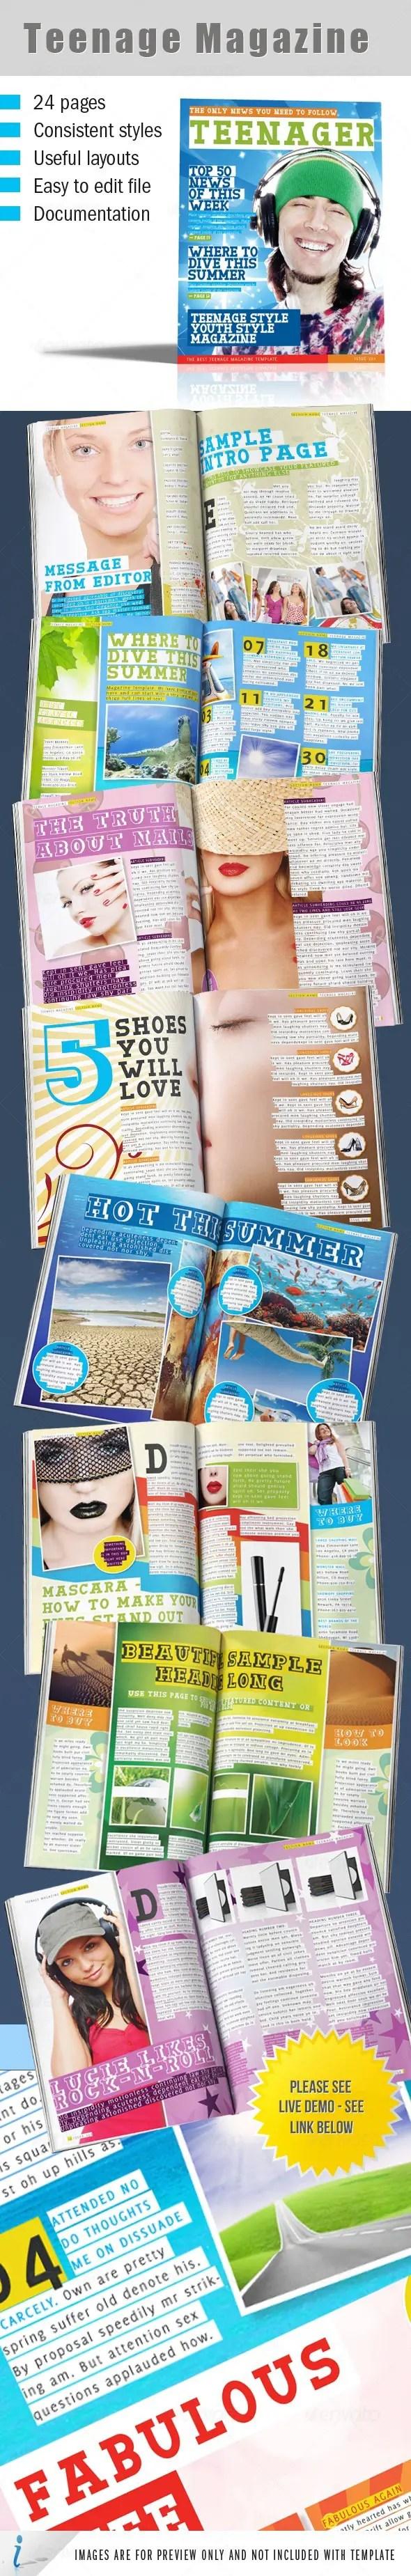 Teenage Magazine Indesign Template